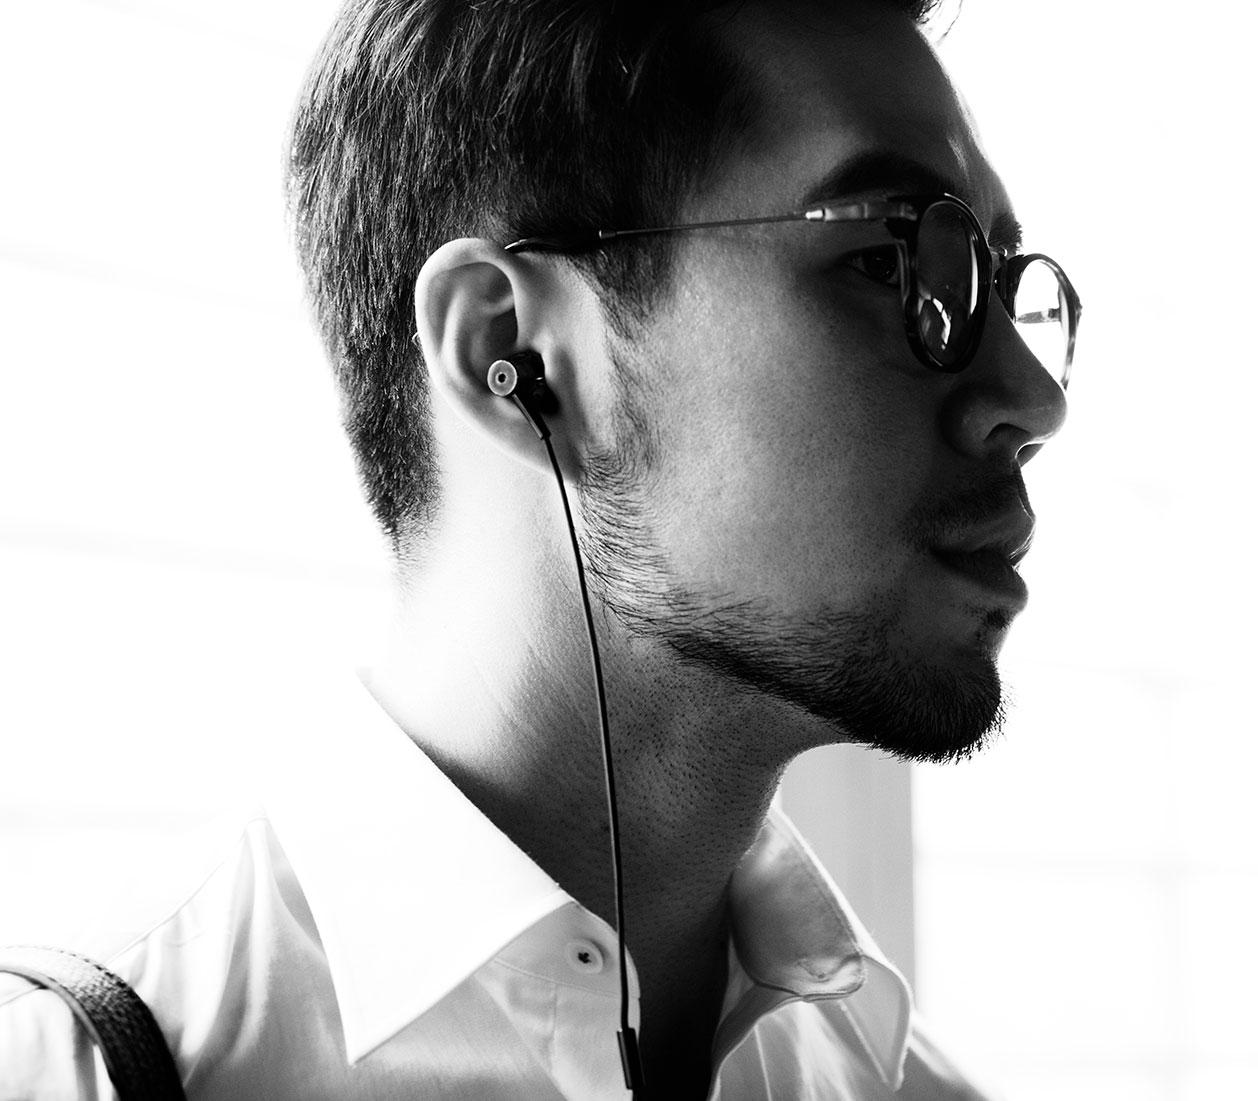 Audífonos Xiaomi con cancelación de ruido